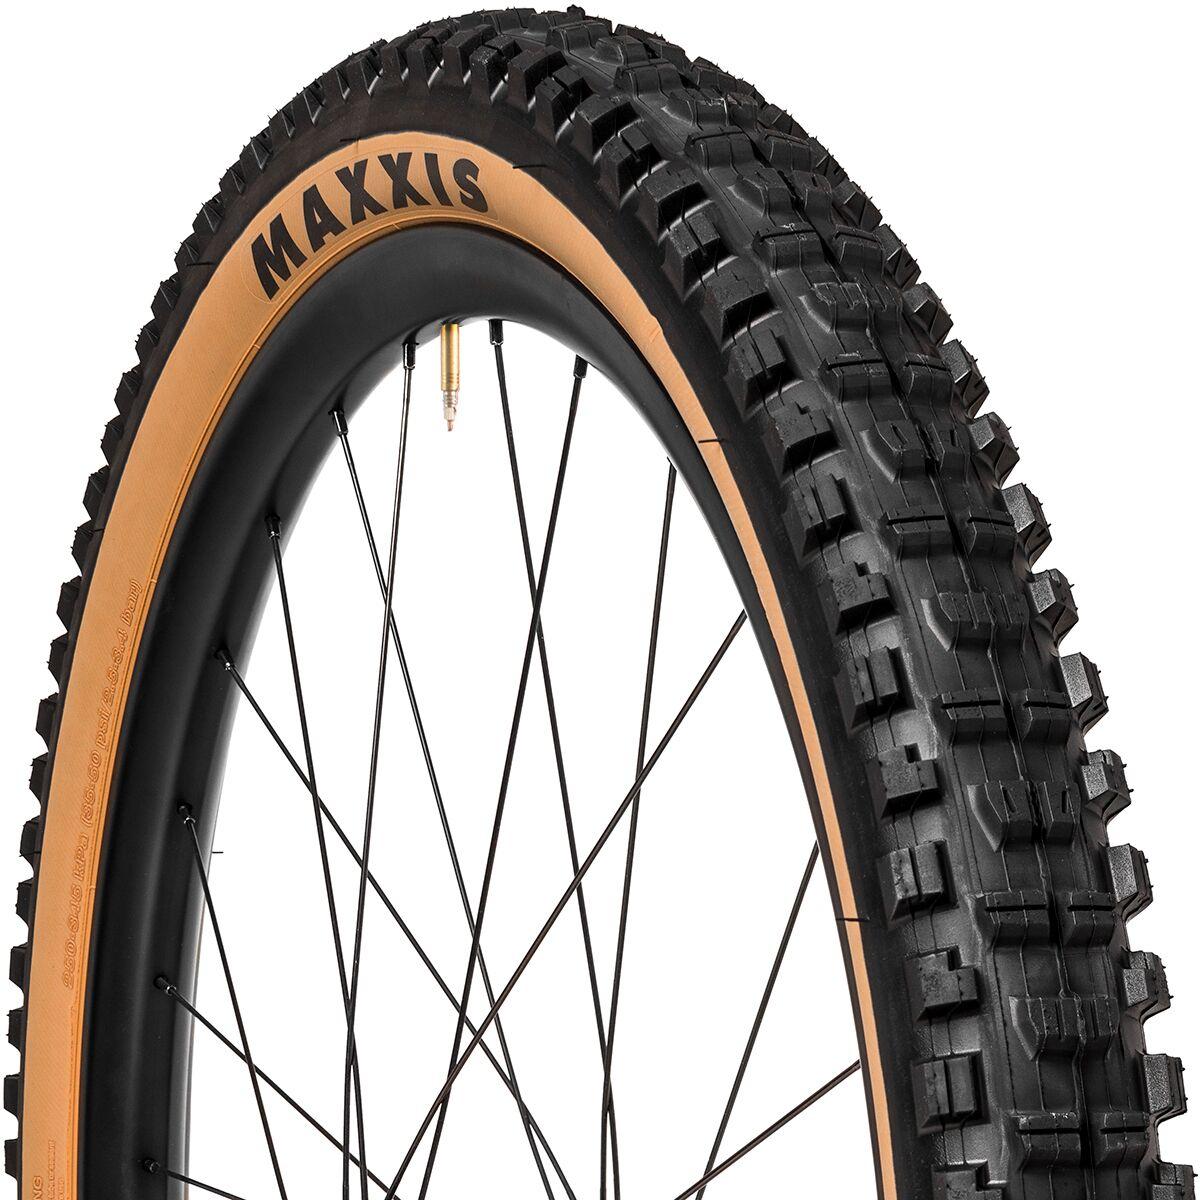 Black//Tan Tubeless Maxxis Minion DHR II Tire 27.5 x 2.4 Folding EXO Dual